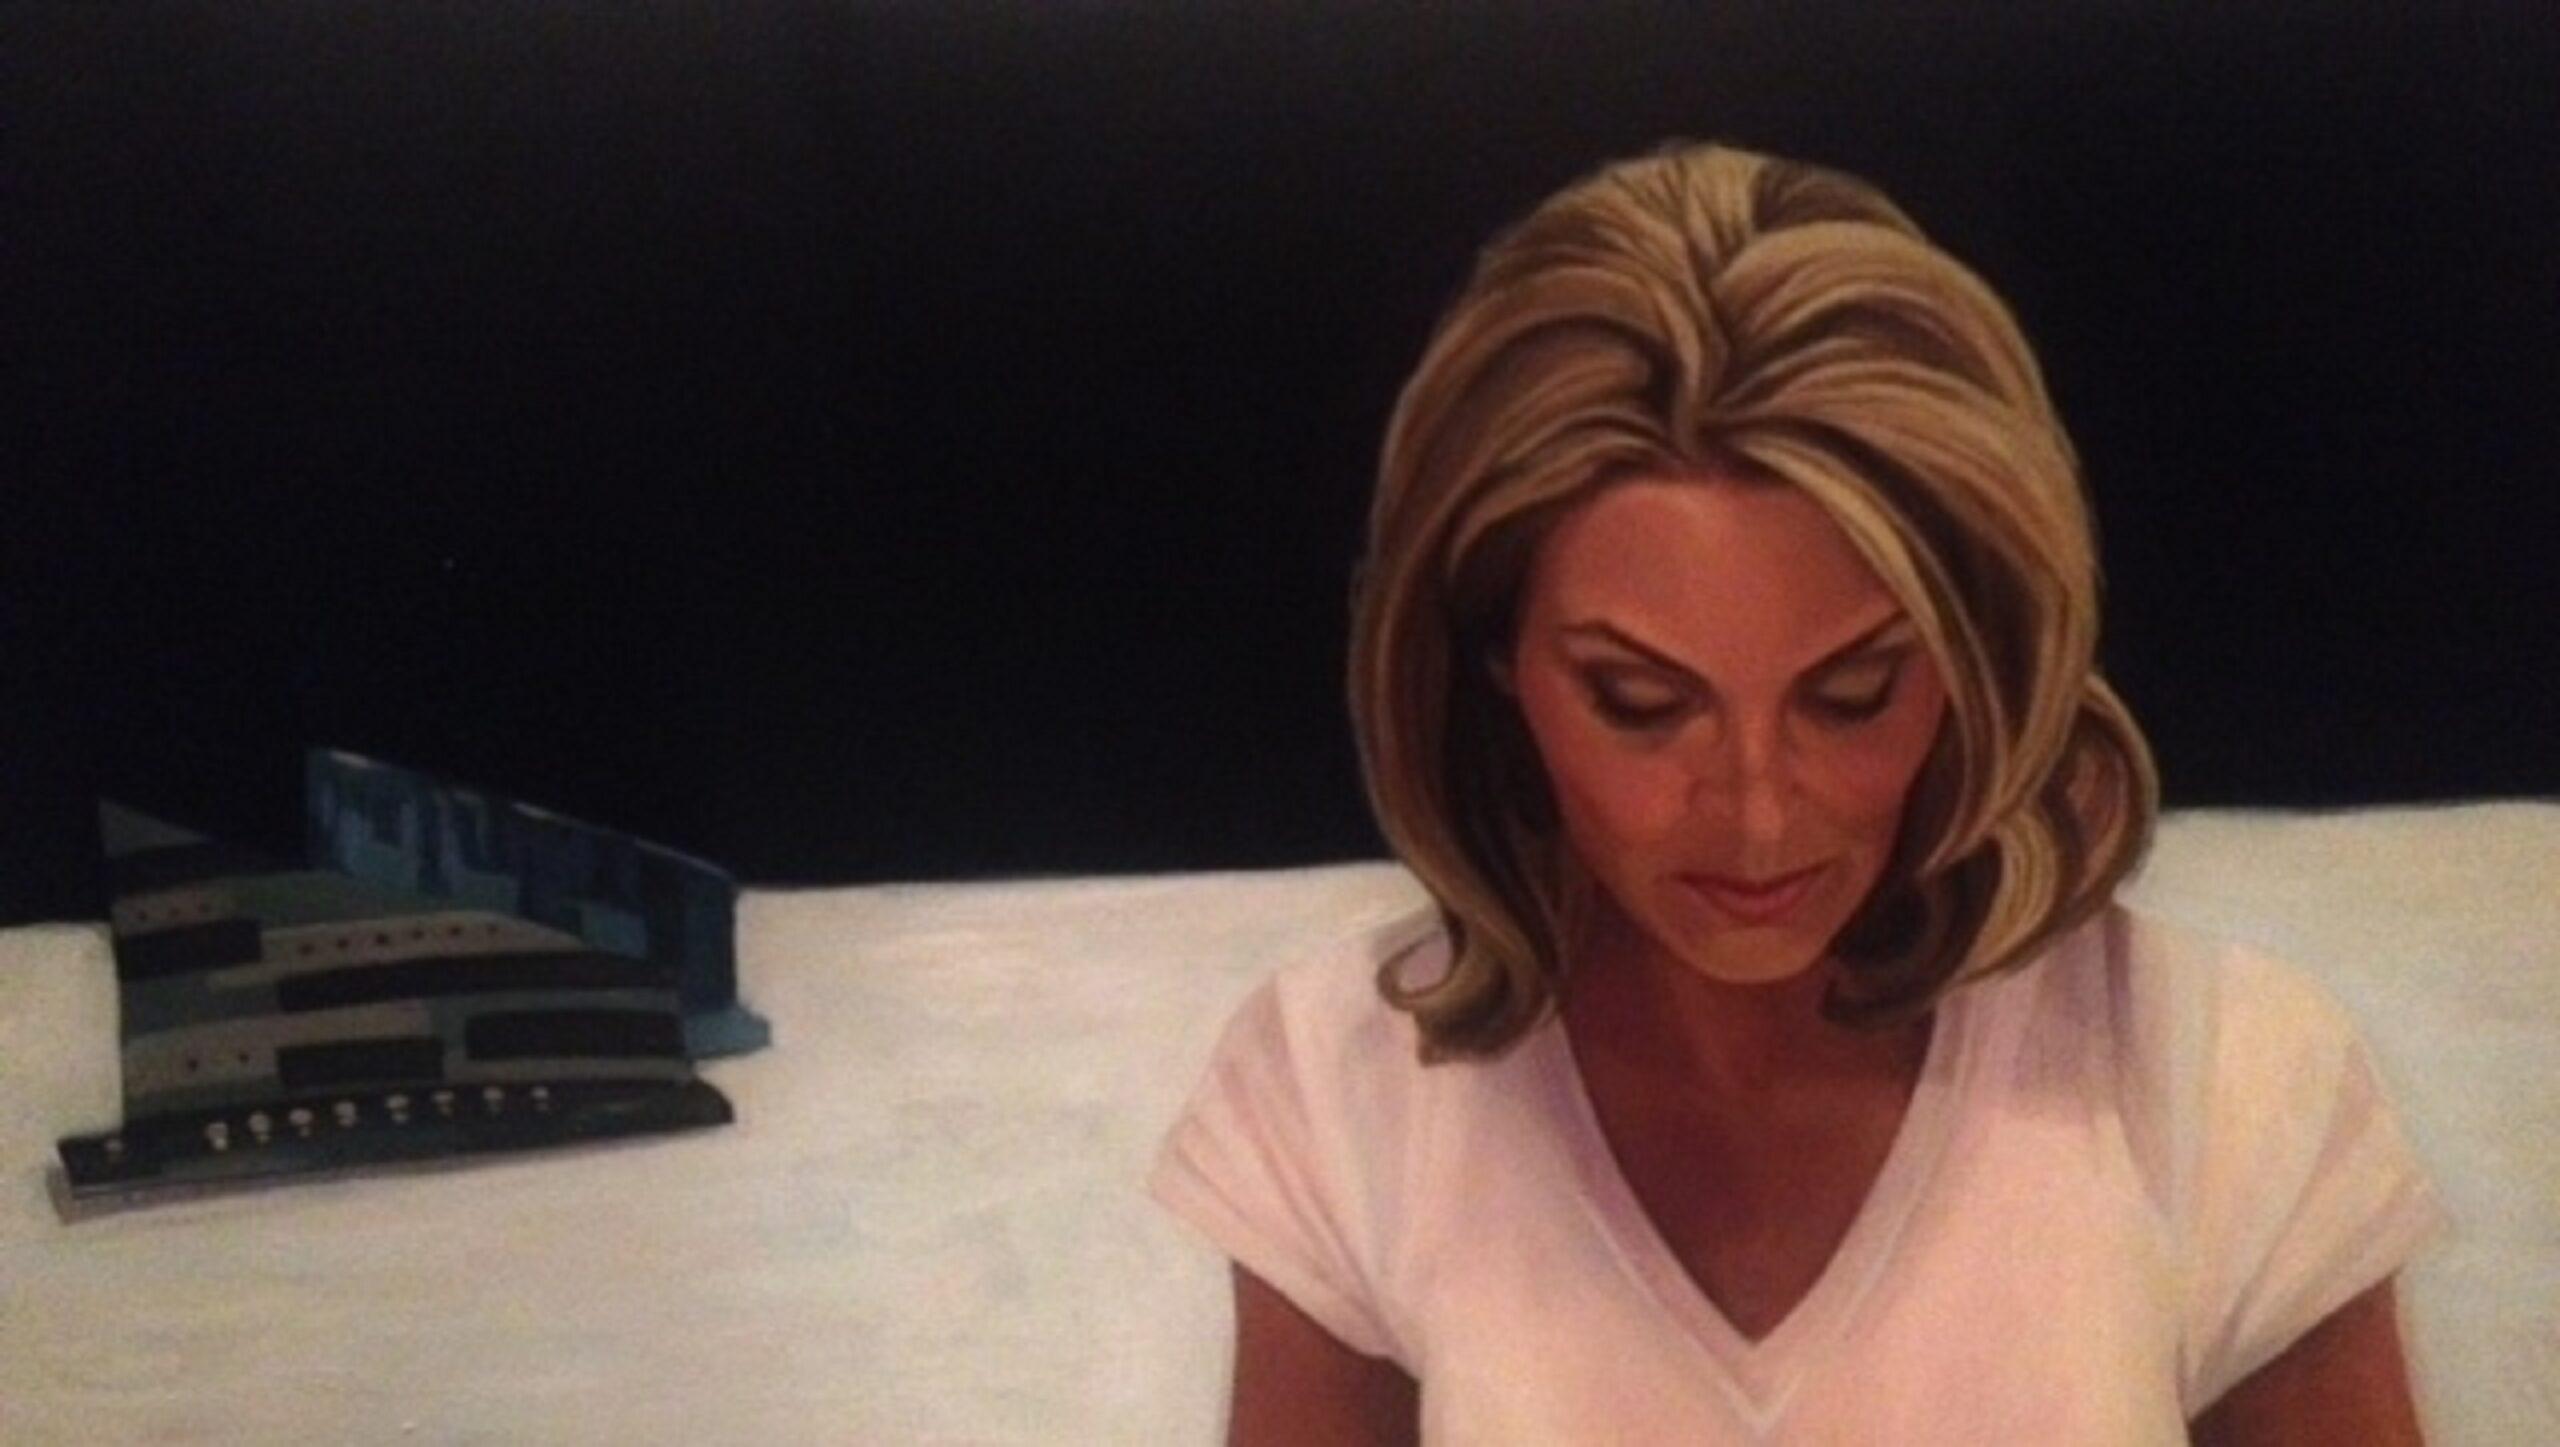 Portrait of Jacki Cohen, 38x18, Oil on Canvas by Carla Keaton Fine Arts in Tempe, Arizona